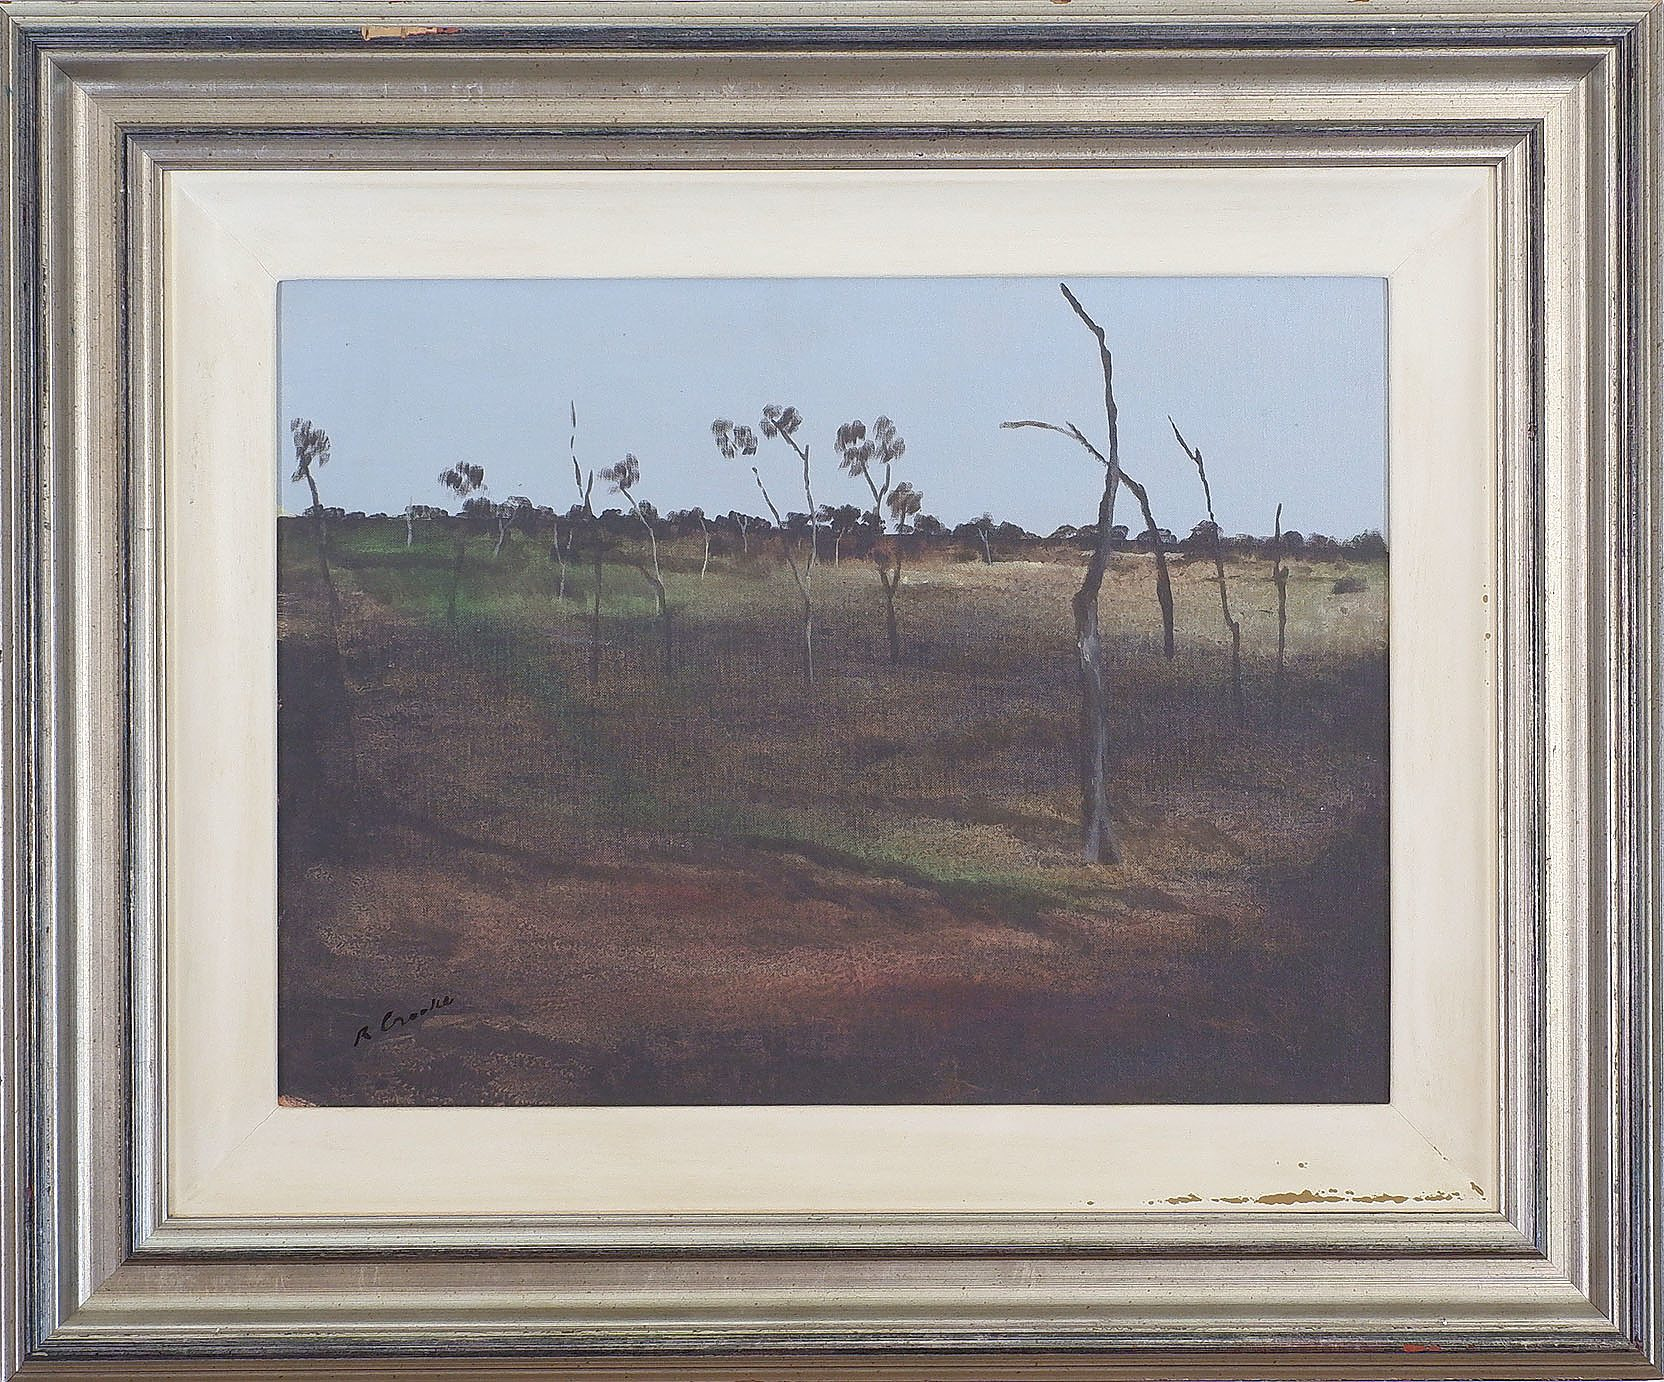 'Ray Crooke (1922-2015), Cape York, Acrylic on Canvas'